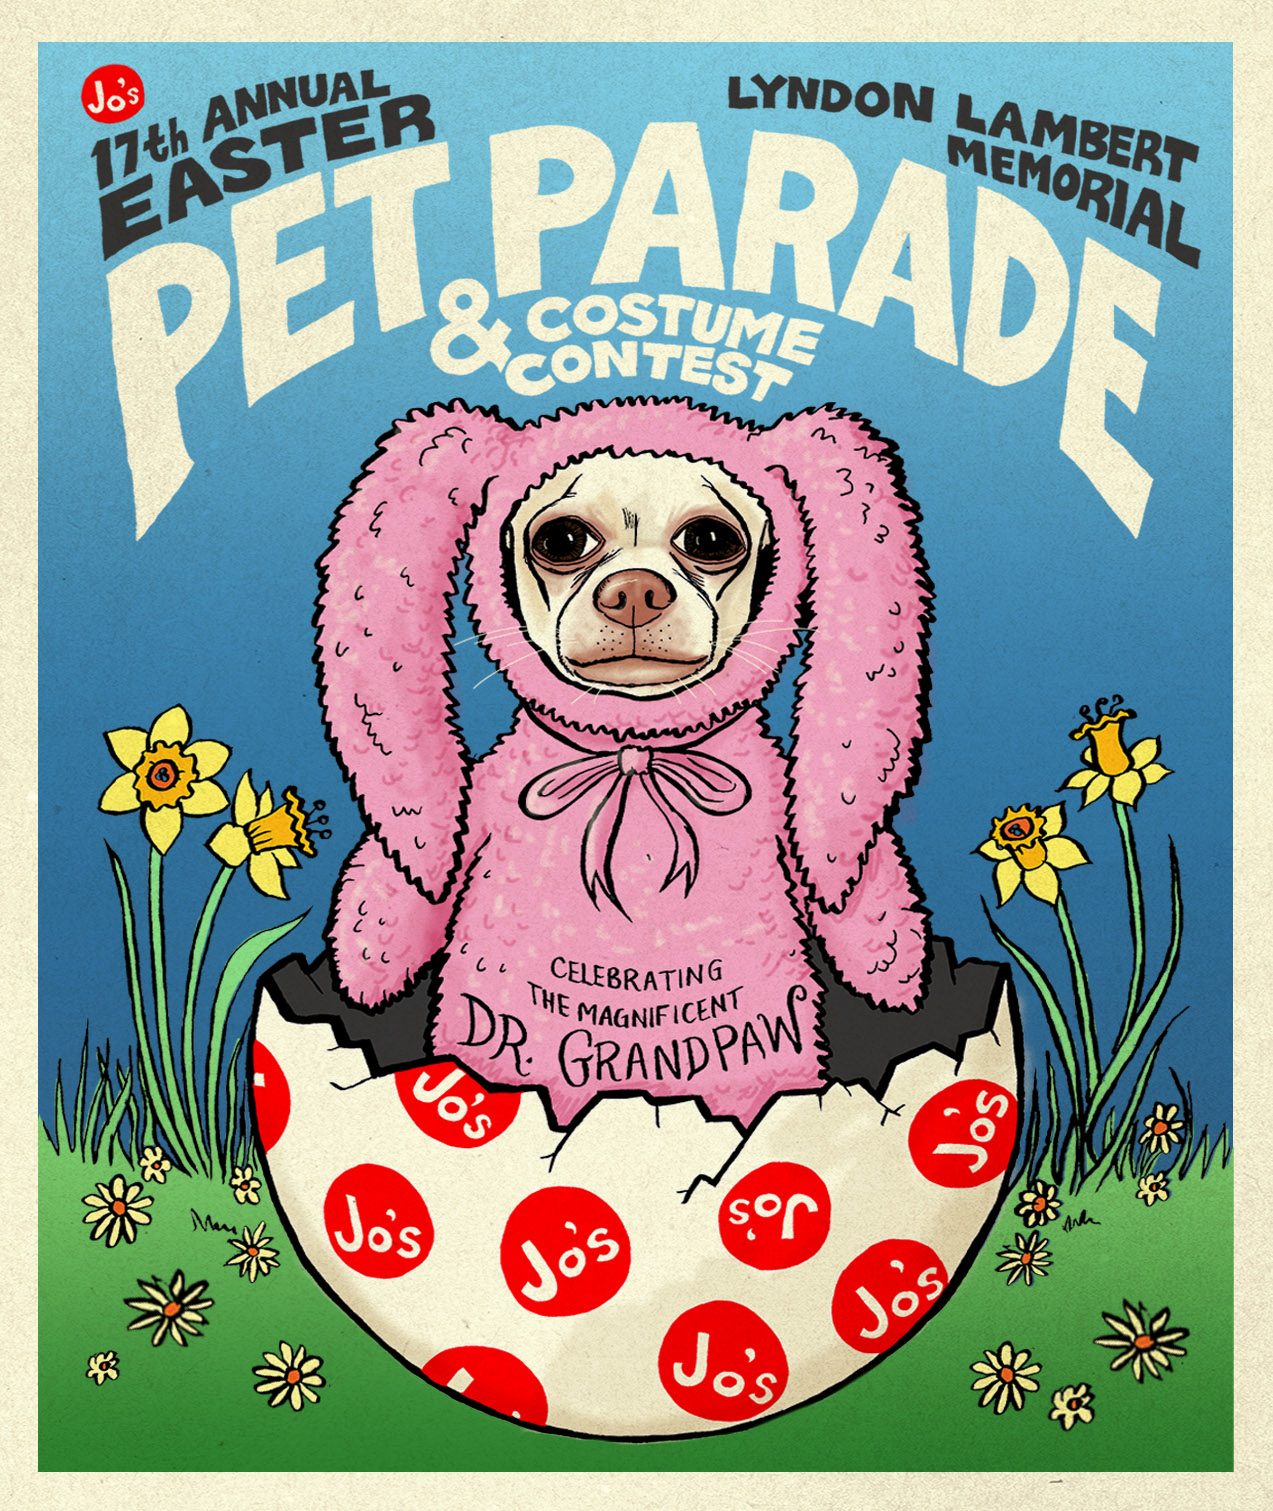 Jos pet parade 2016 IGRAM 01.jpg